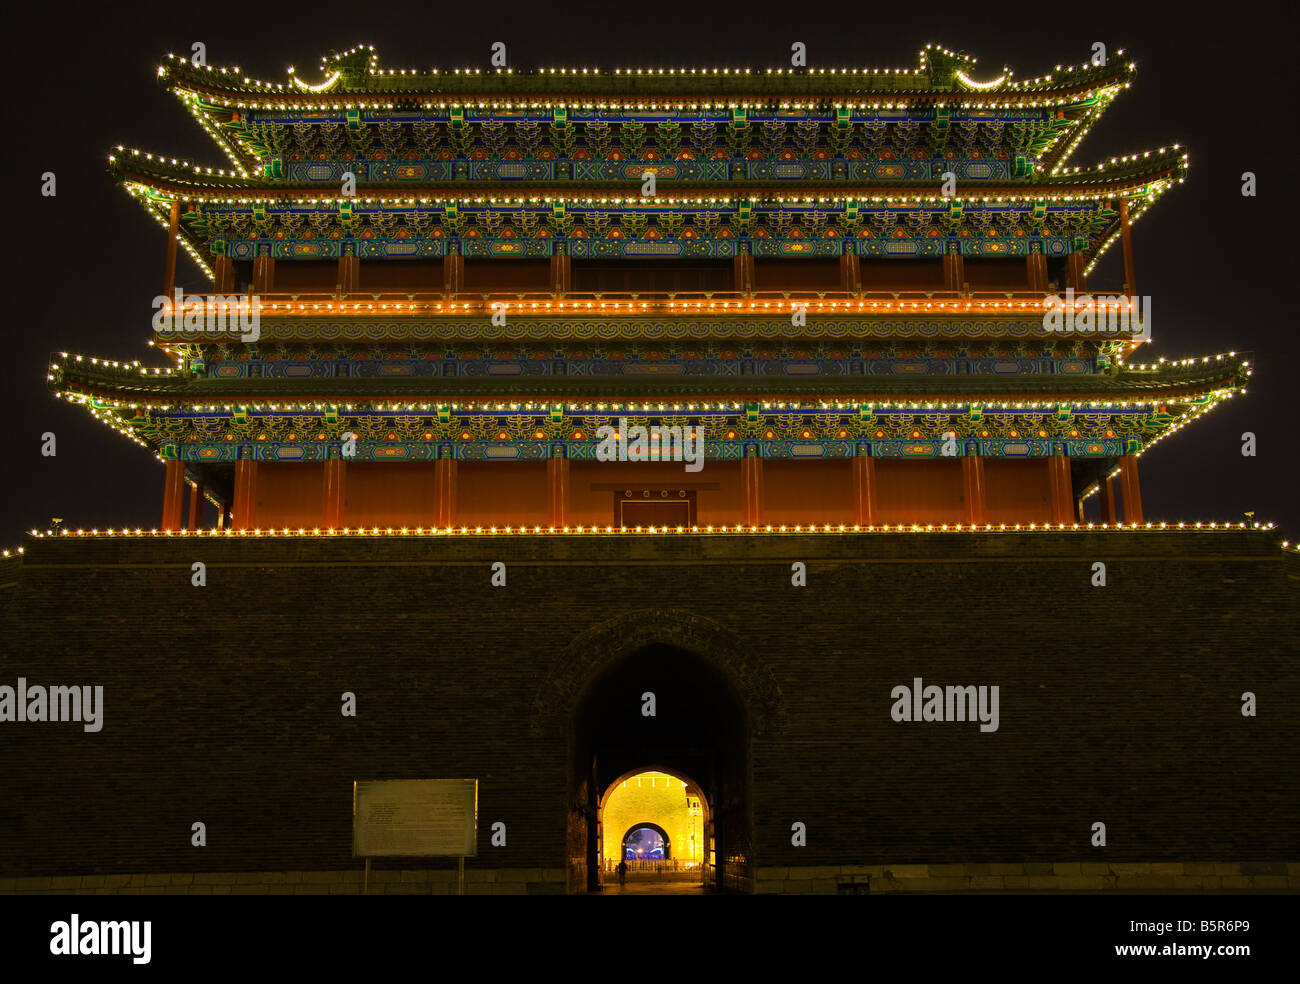 Qianmen Tor Zhengyang Männer betrachten Pfeil Turm Platz des himmlischen Friedens Beijing China Nachtaufnahme Stockfoto